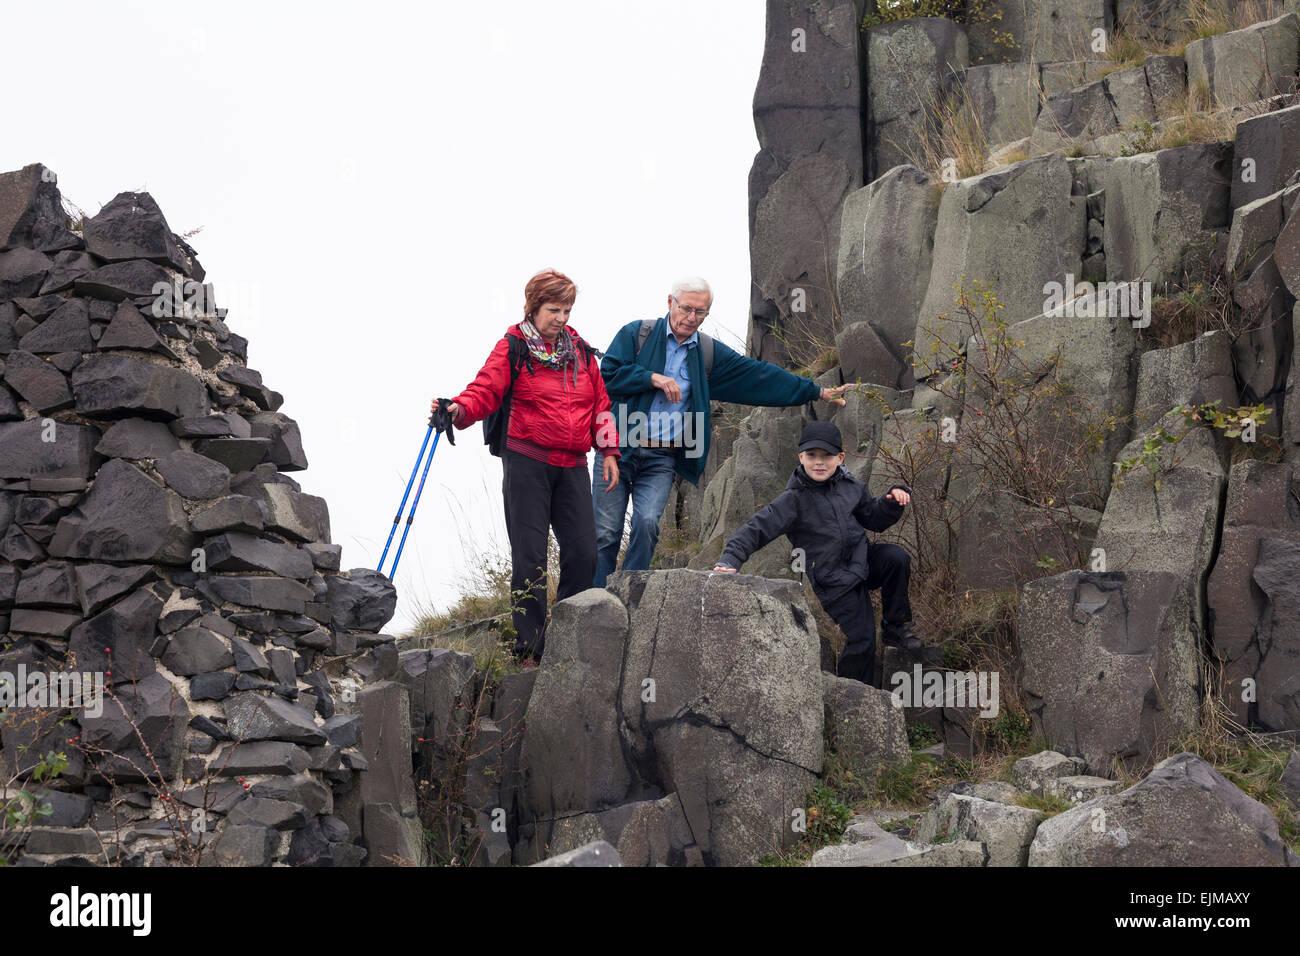 Senior couple and child boy trekking on rocky terrain. - Stock Image